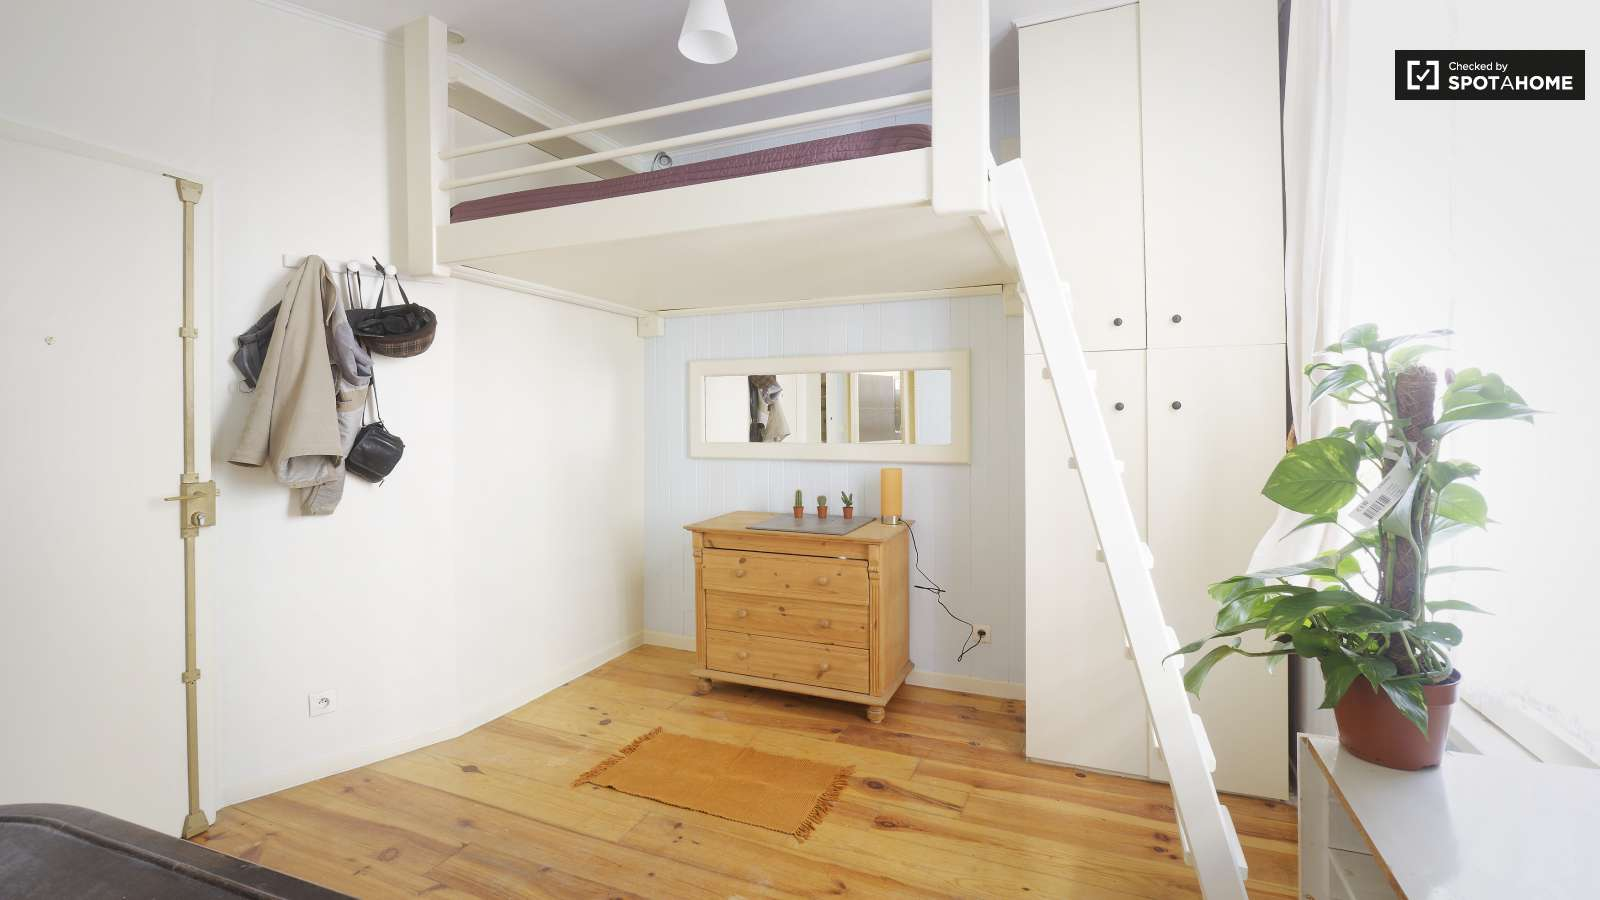 Sunny Studio with Washer and Dryer in Ivry-Sur-Seine (ref: 102872 ...